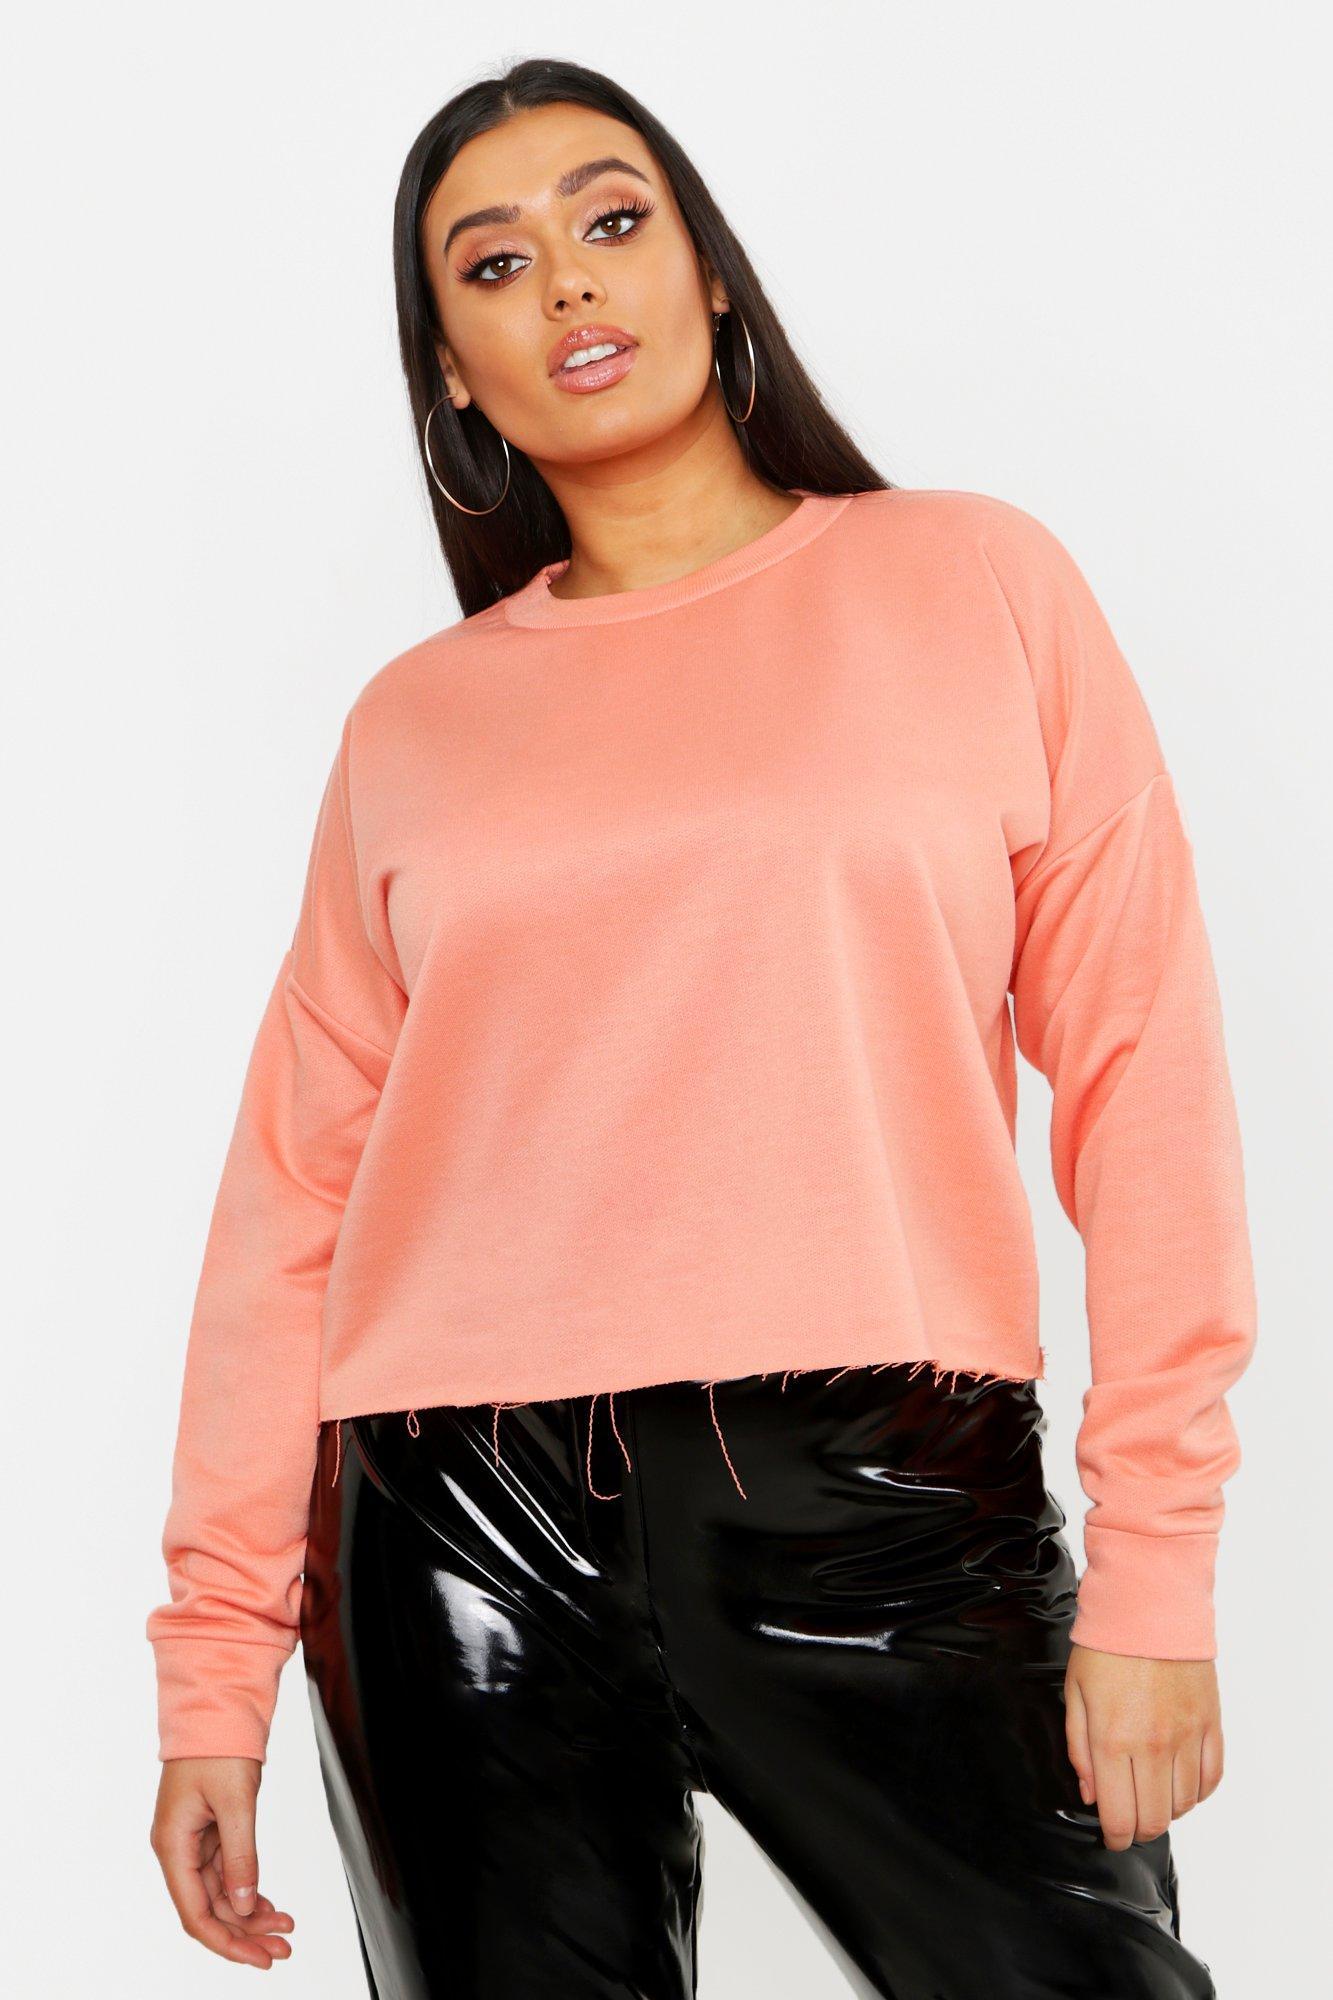 Womens Plus - oversized Boxy Sweatshirt mit unverarbeitetem Saum - Korallrot - 44, Korallrot - Boohoo.com